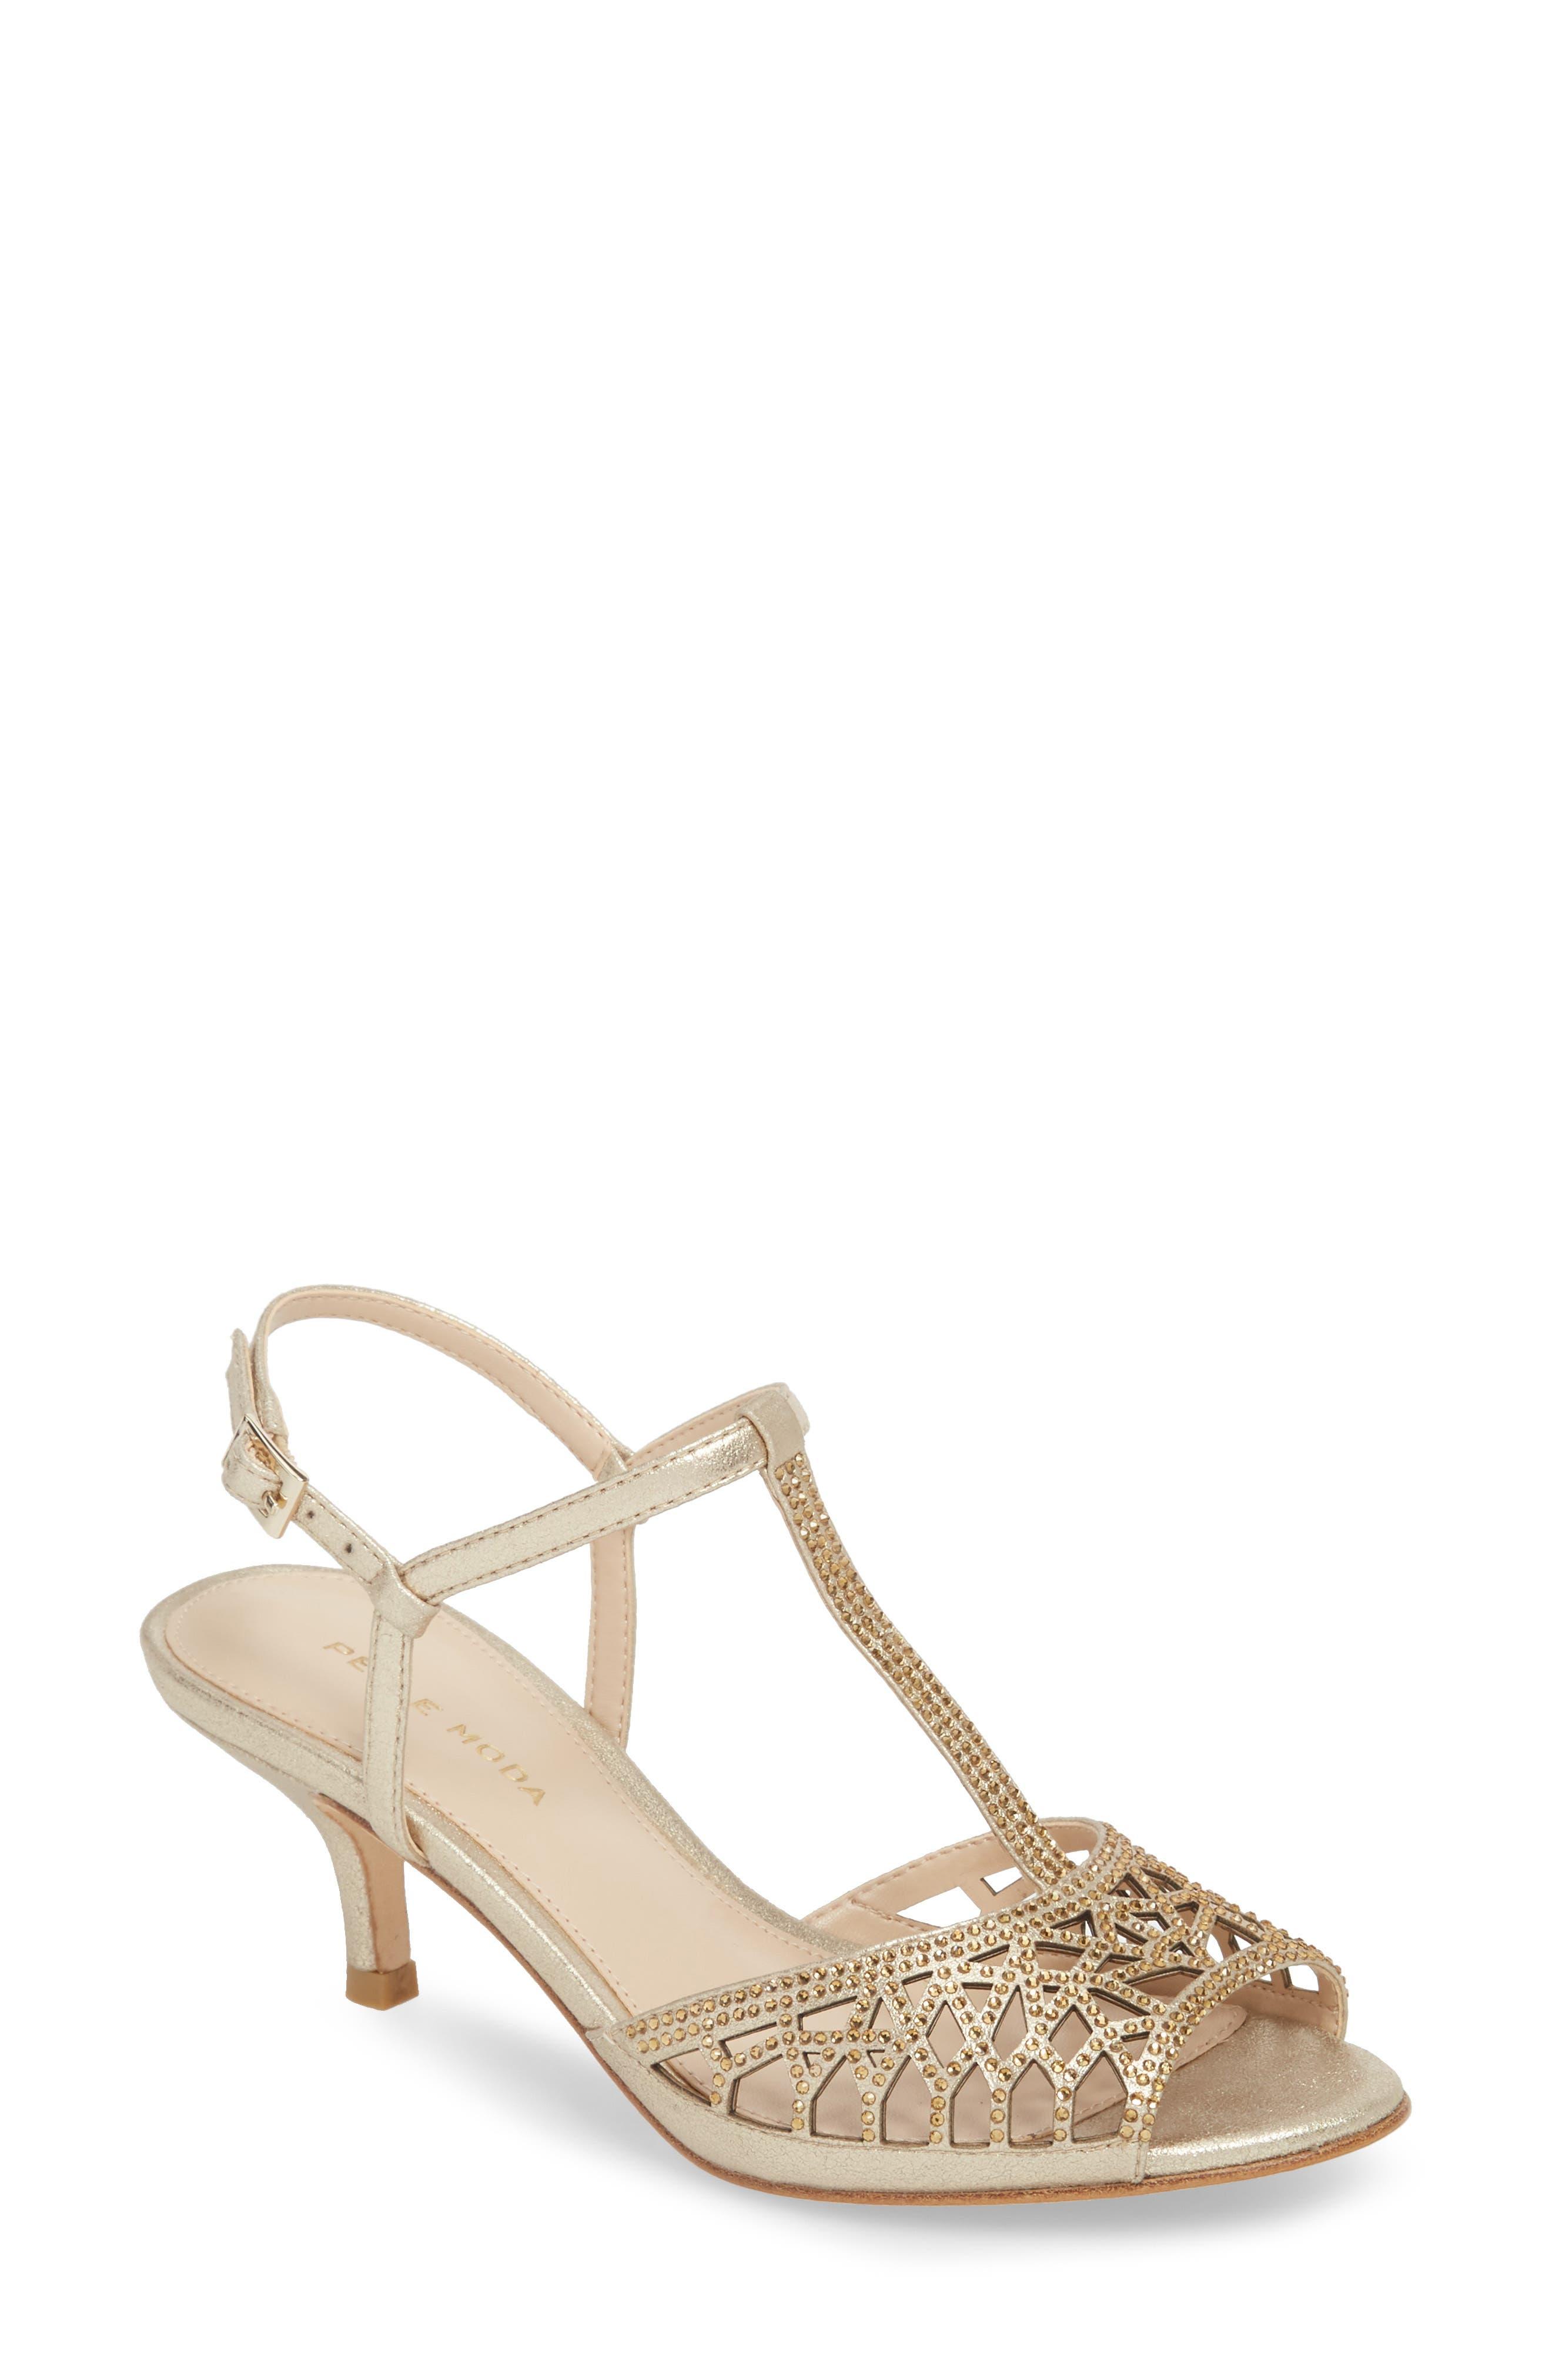 Adaline Embellished Sandal,                             Main thumbnail 1, color,                             Platinum Gold Metallic Suede